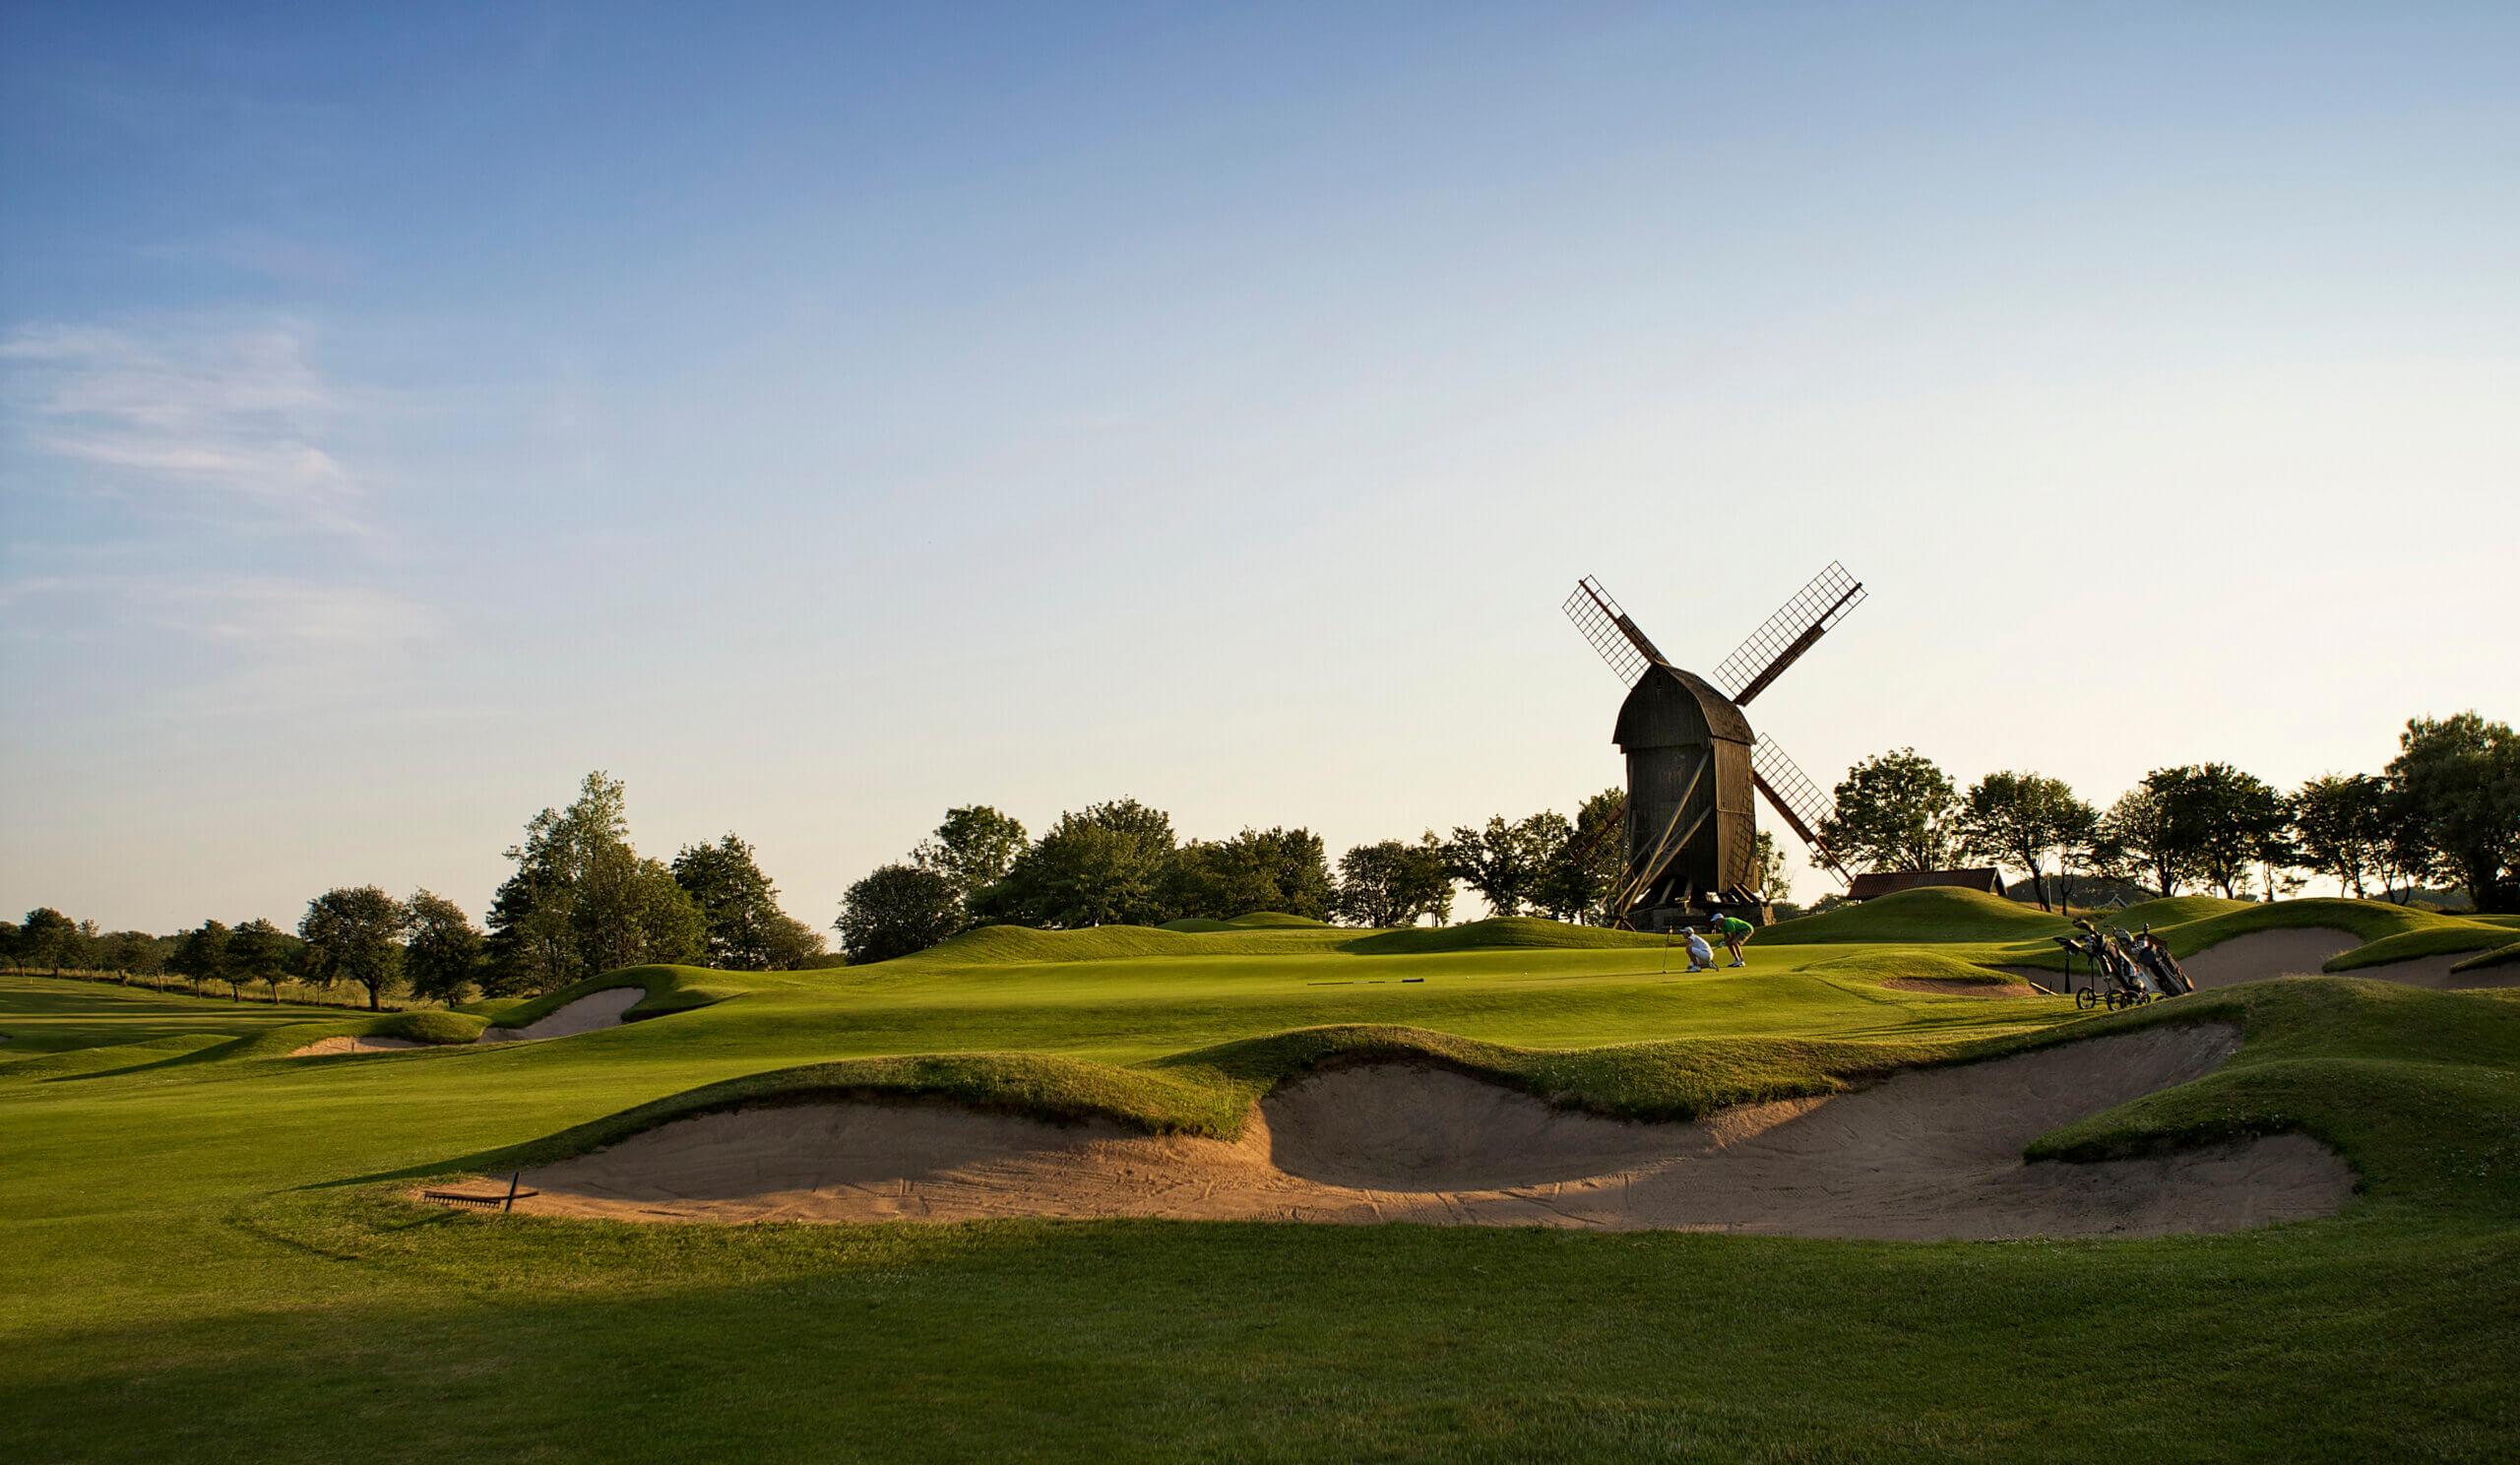 Play golf at Båstad Golf Club in Skåne